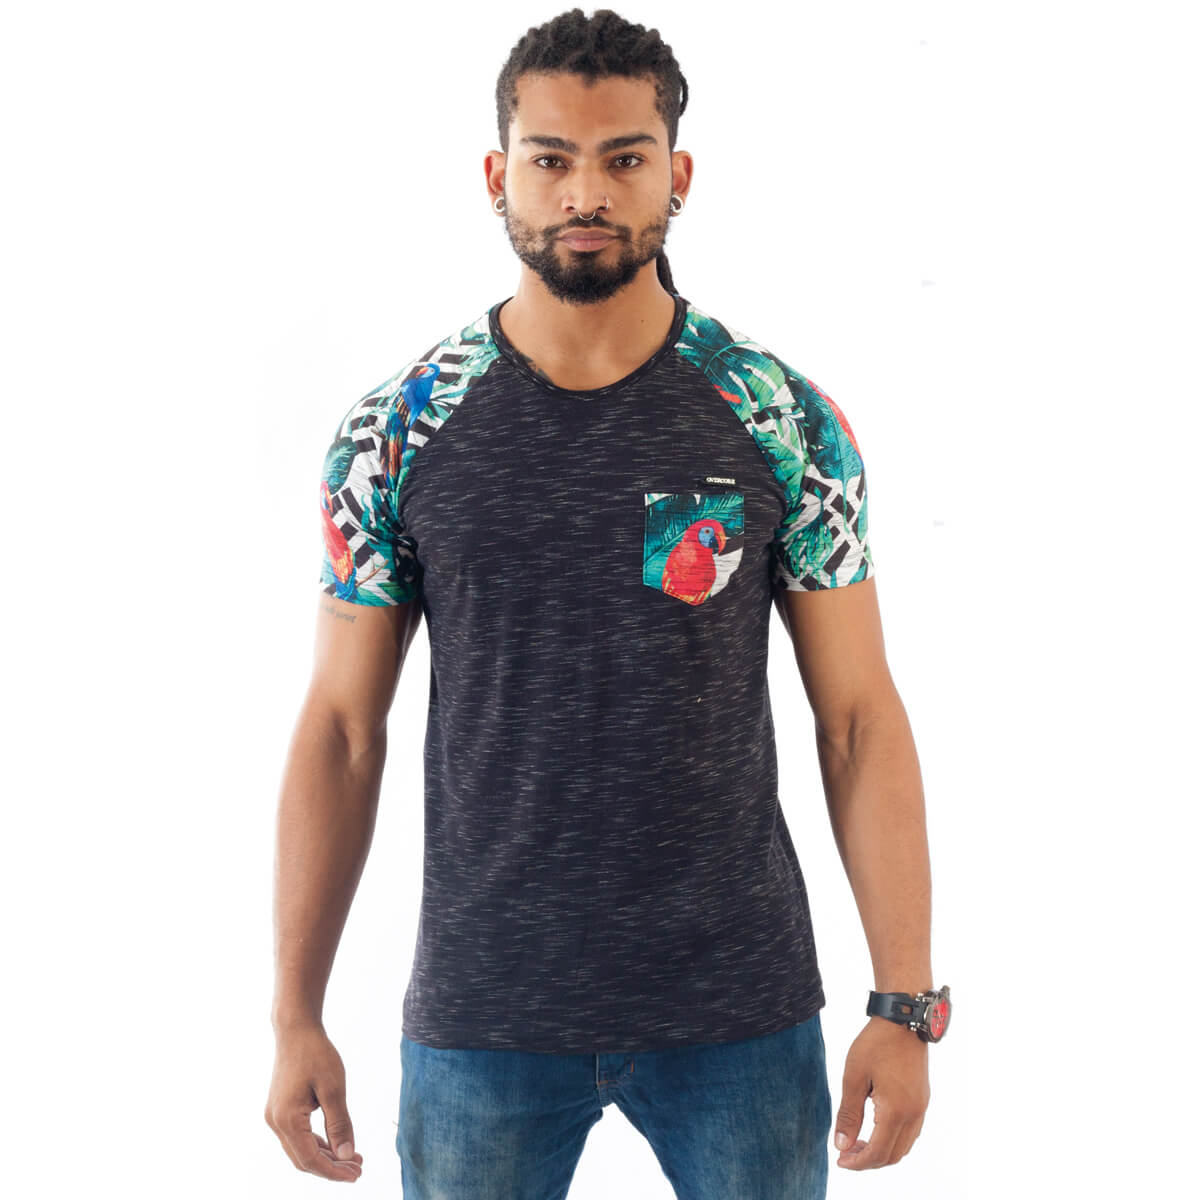 Camiseta Masculina Estampada Tropical